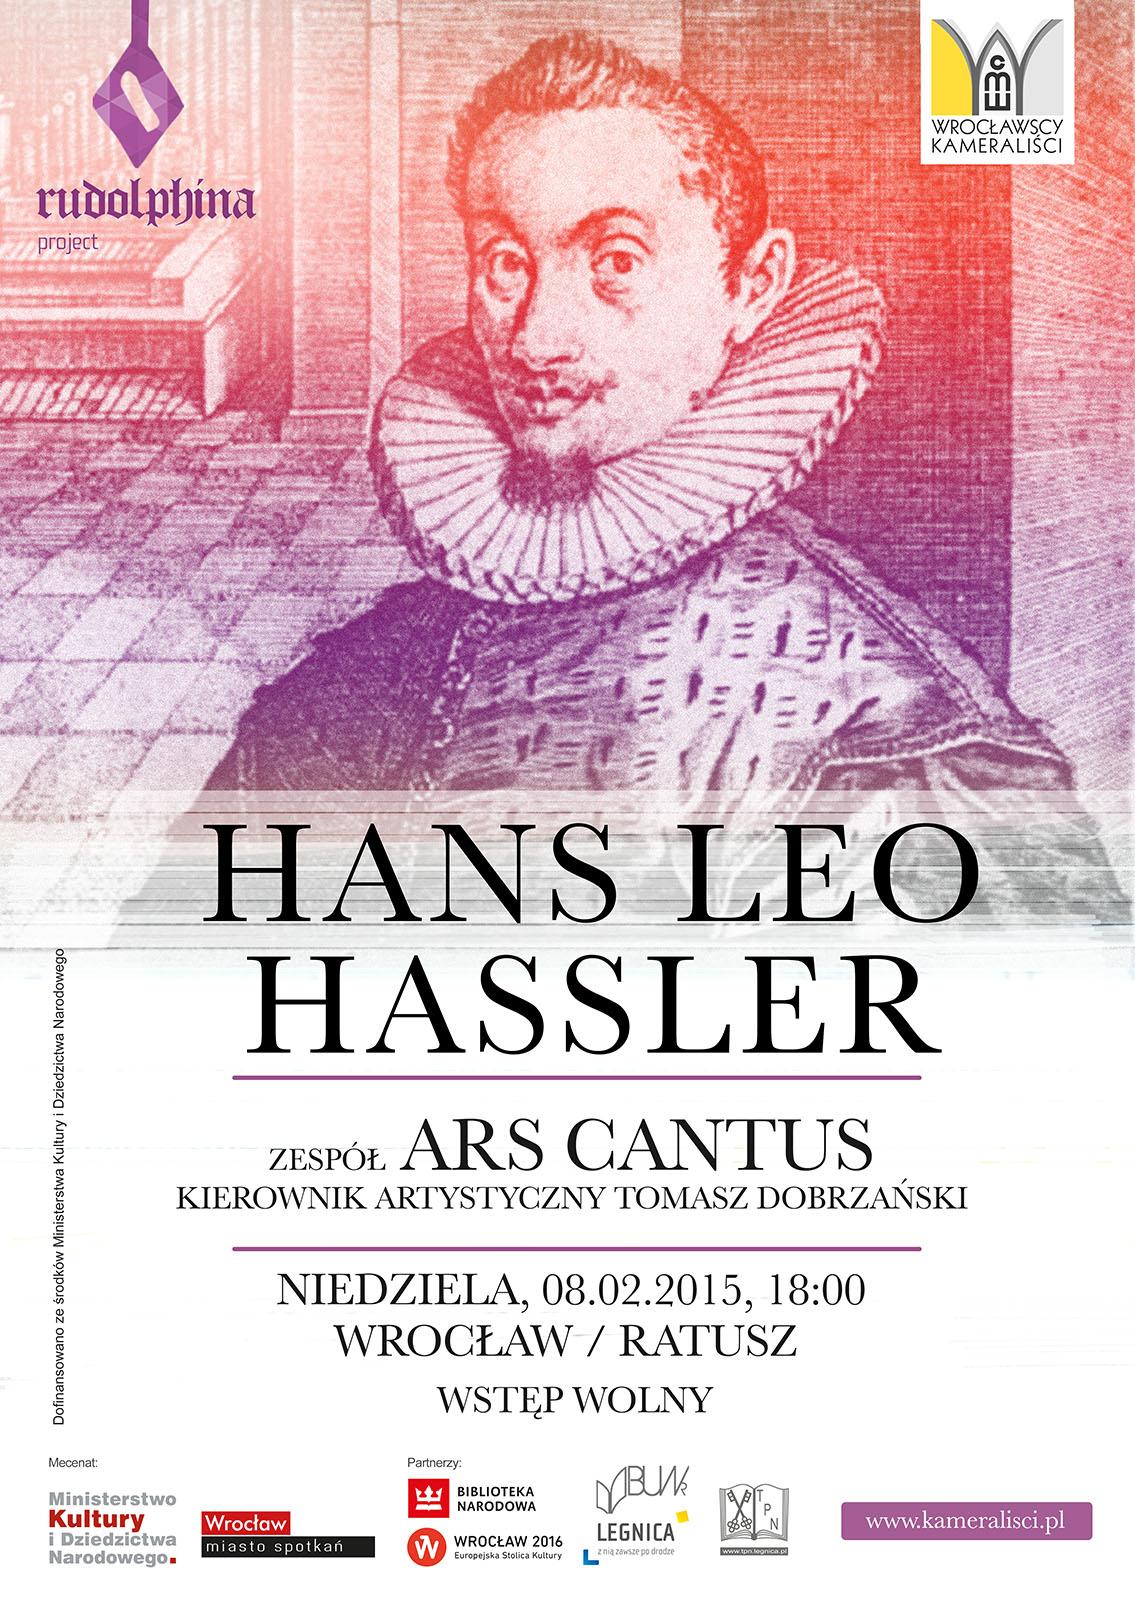 Koncert  HANS LEO HASSLER  w wykonaniu ARS CANTUS